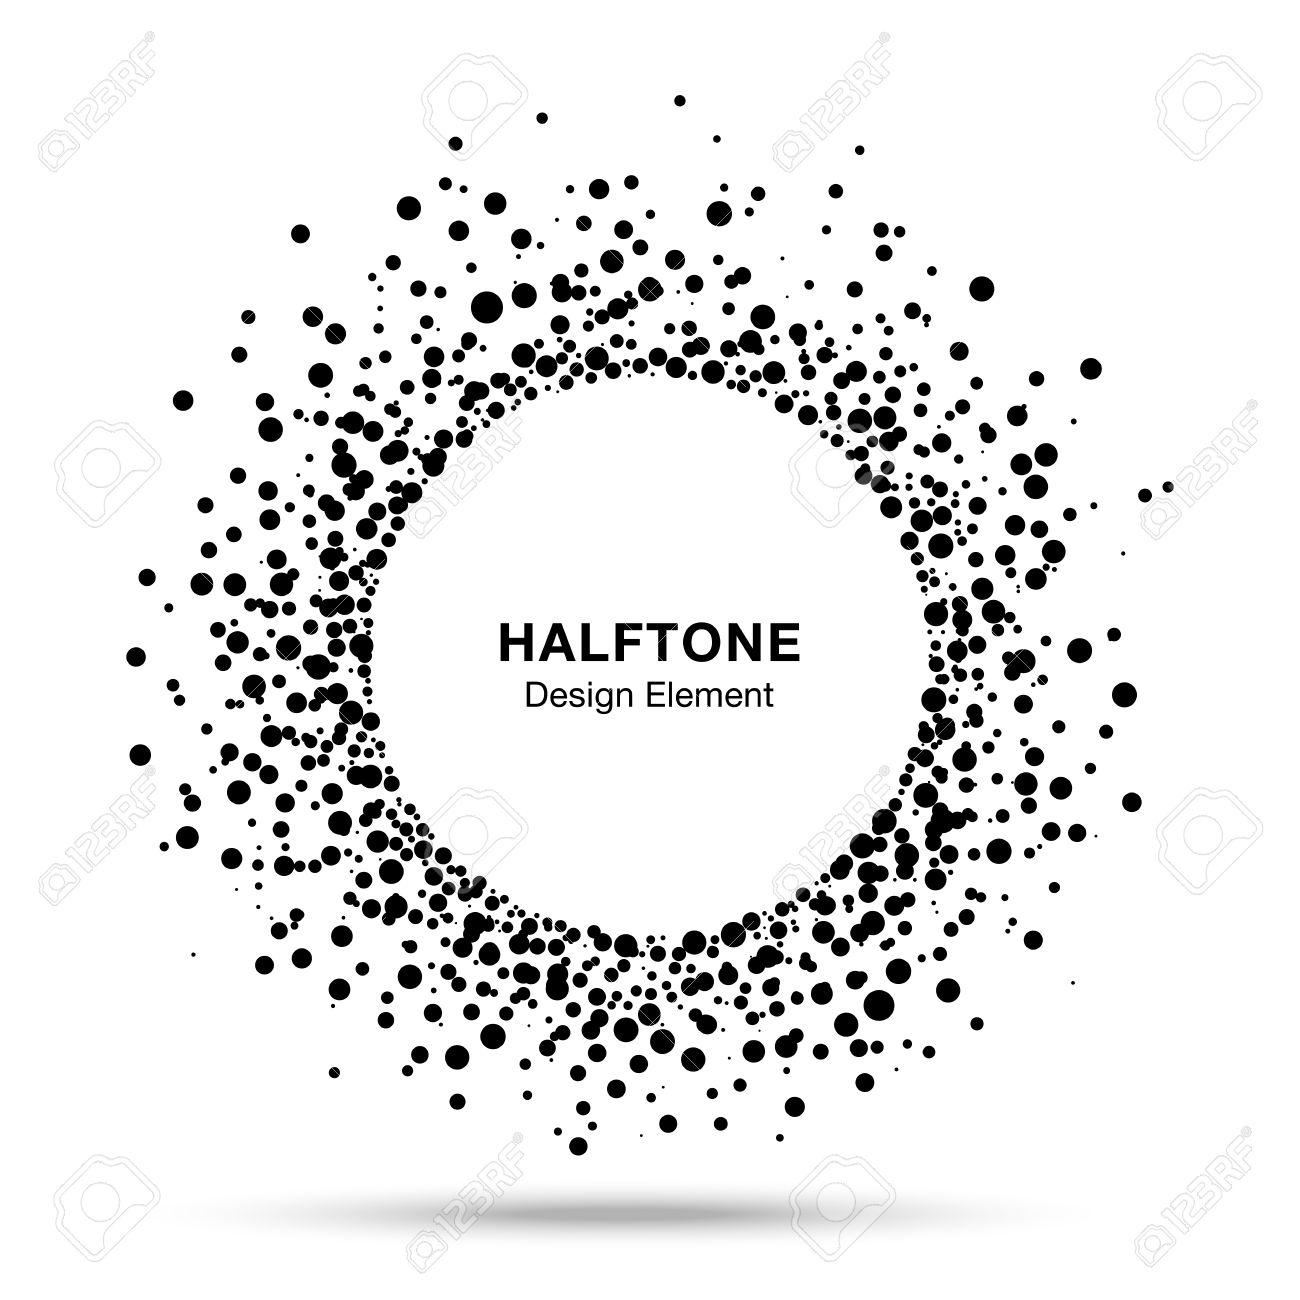 Black Abstract Halftone Logo Design Element - 33431018